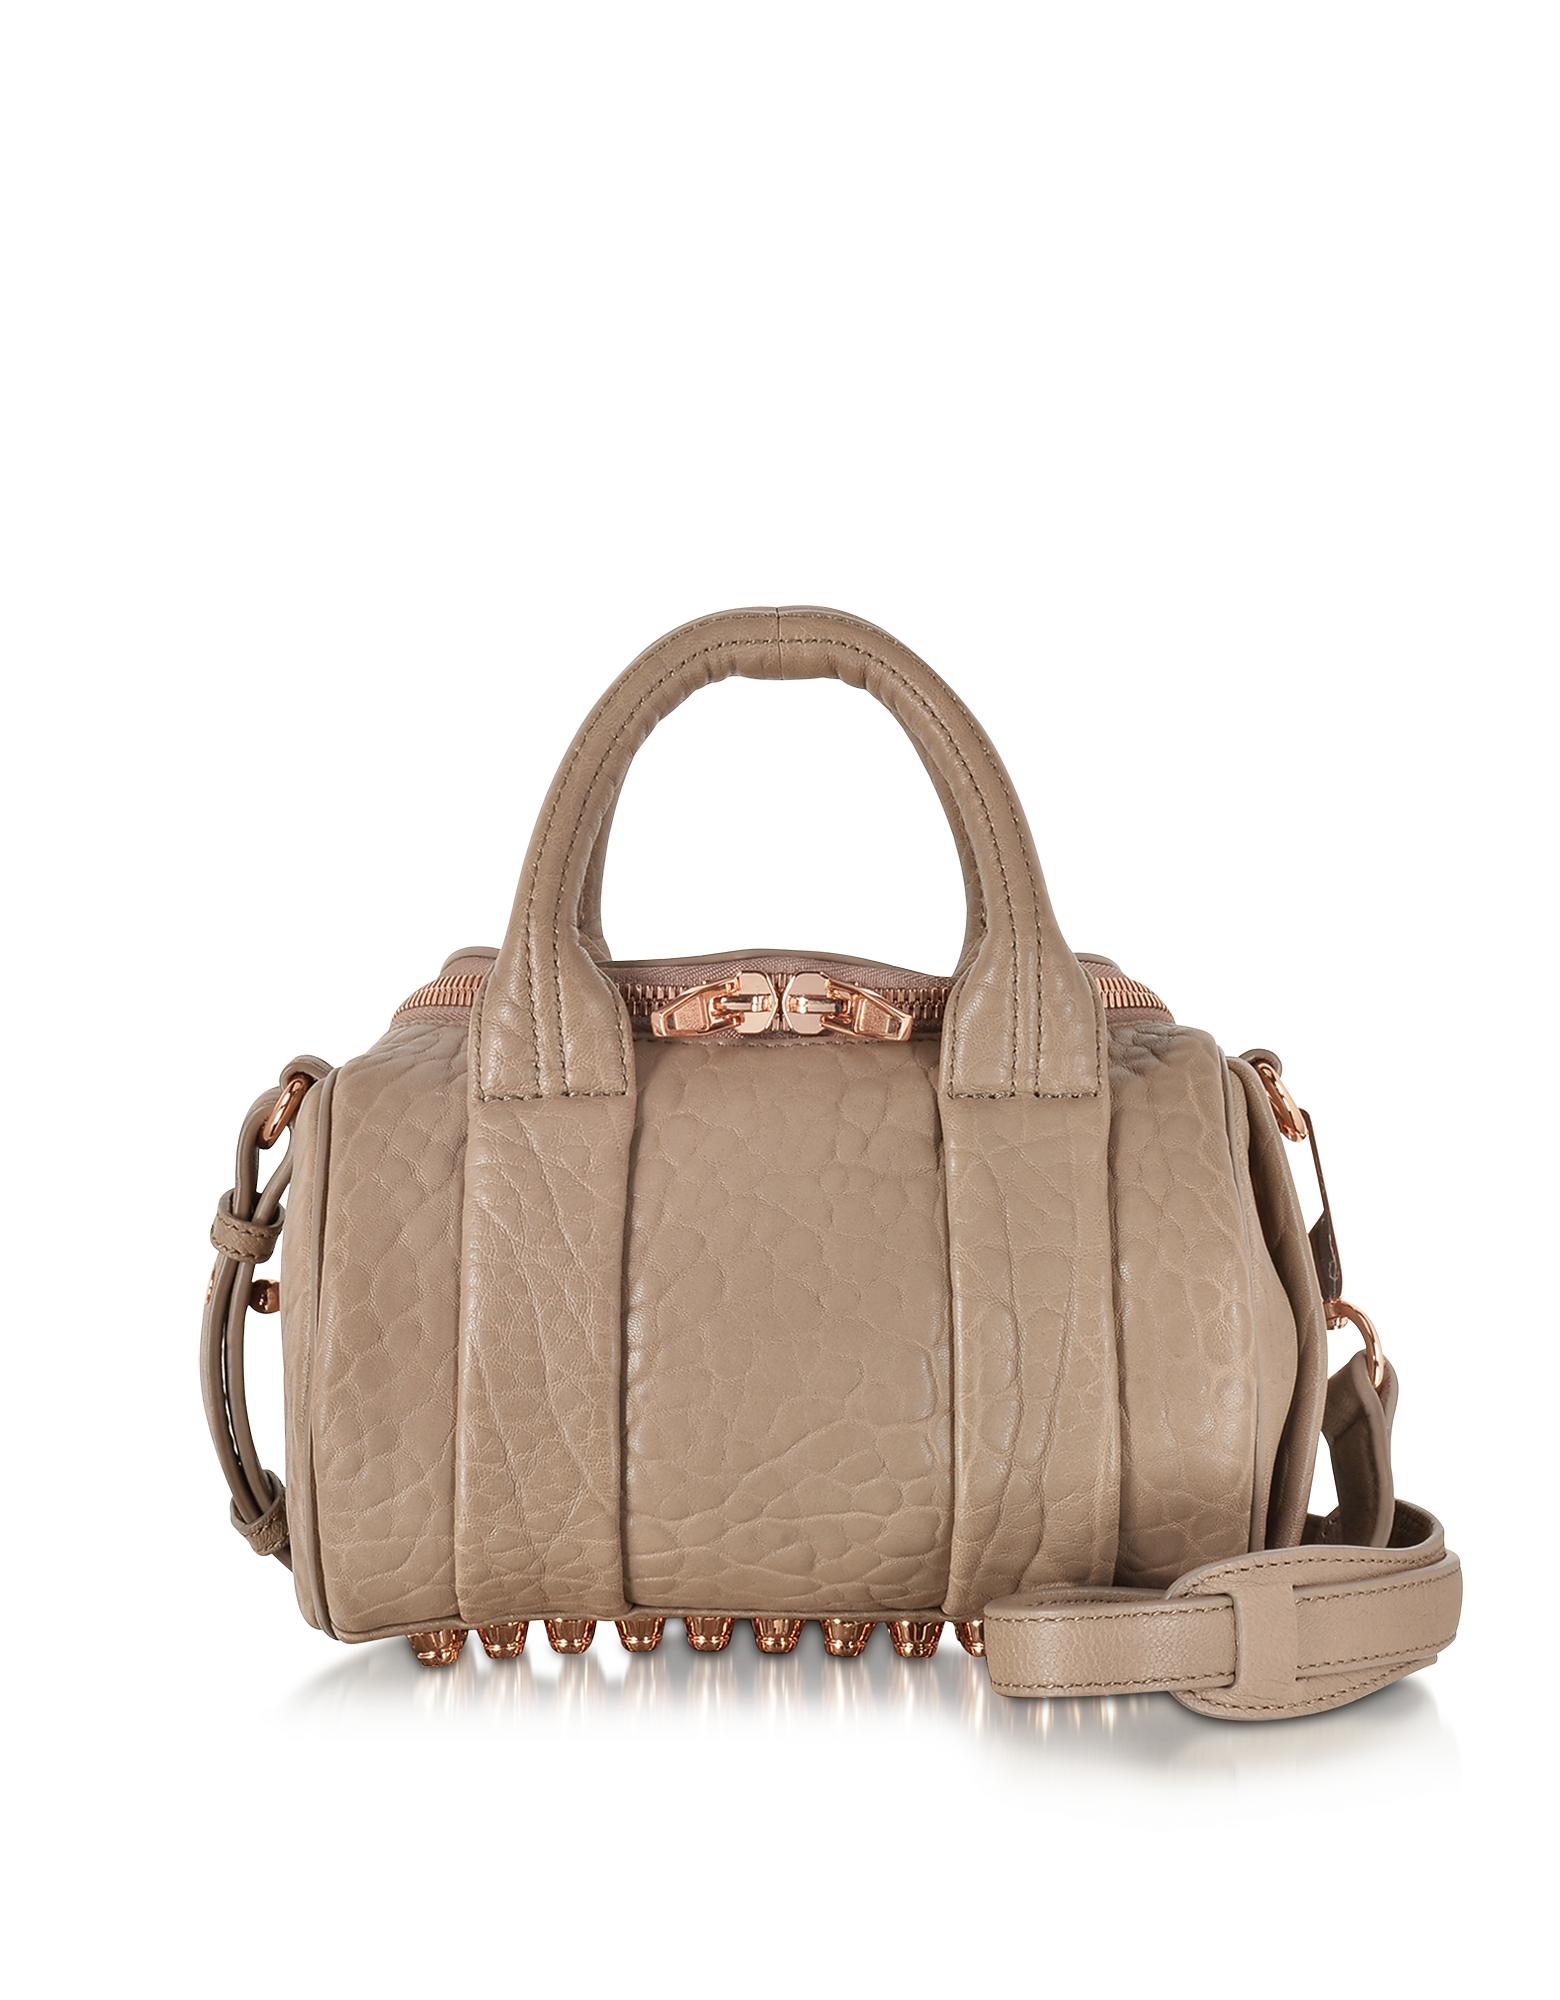 Alexander Wang Handbags, Mini Rockie Latte Pebbled Leather Satchel w/Rose Goldtone Metal